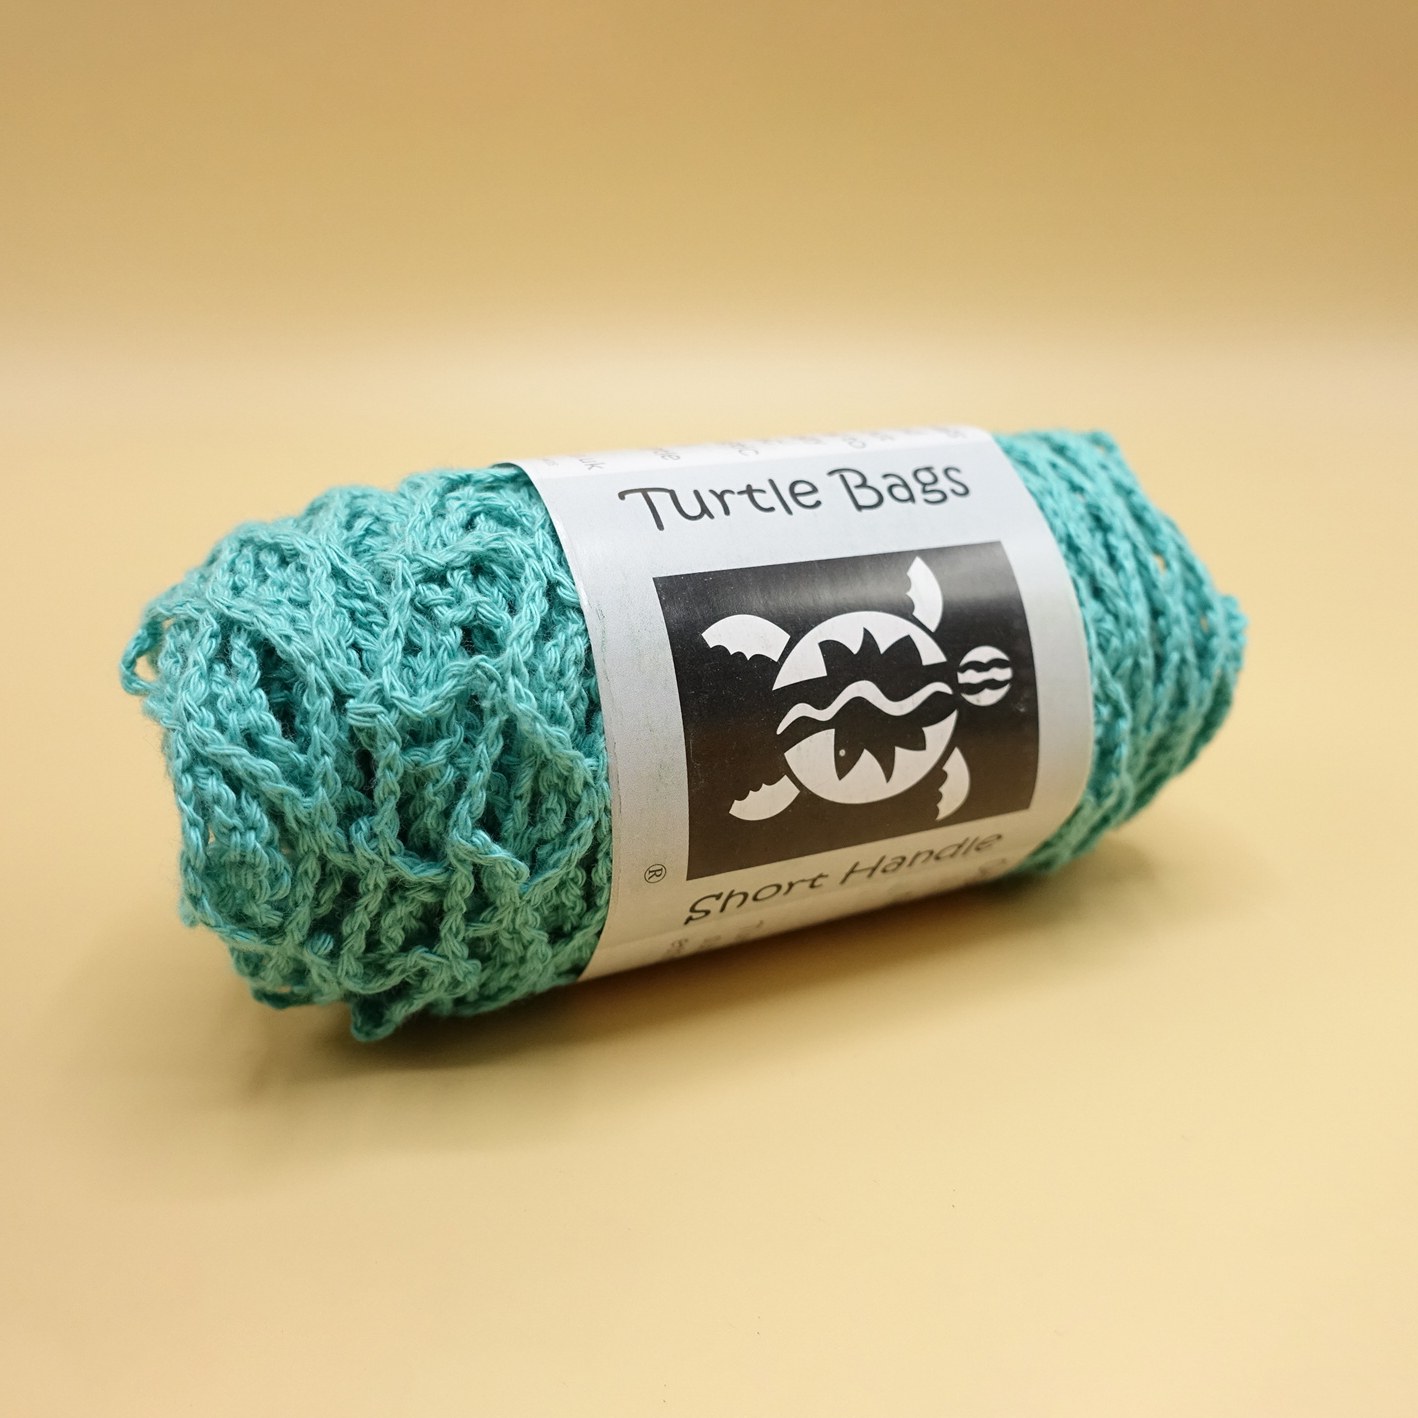 String Bag - Turquoise